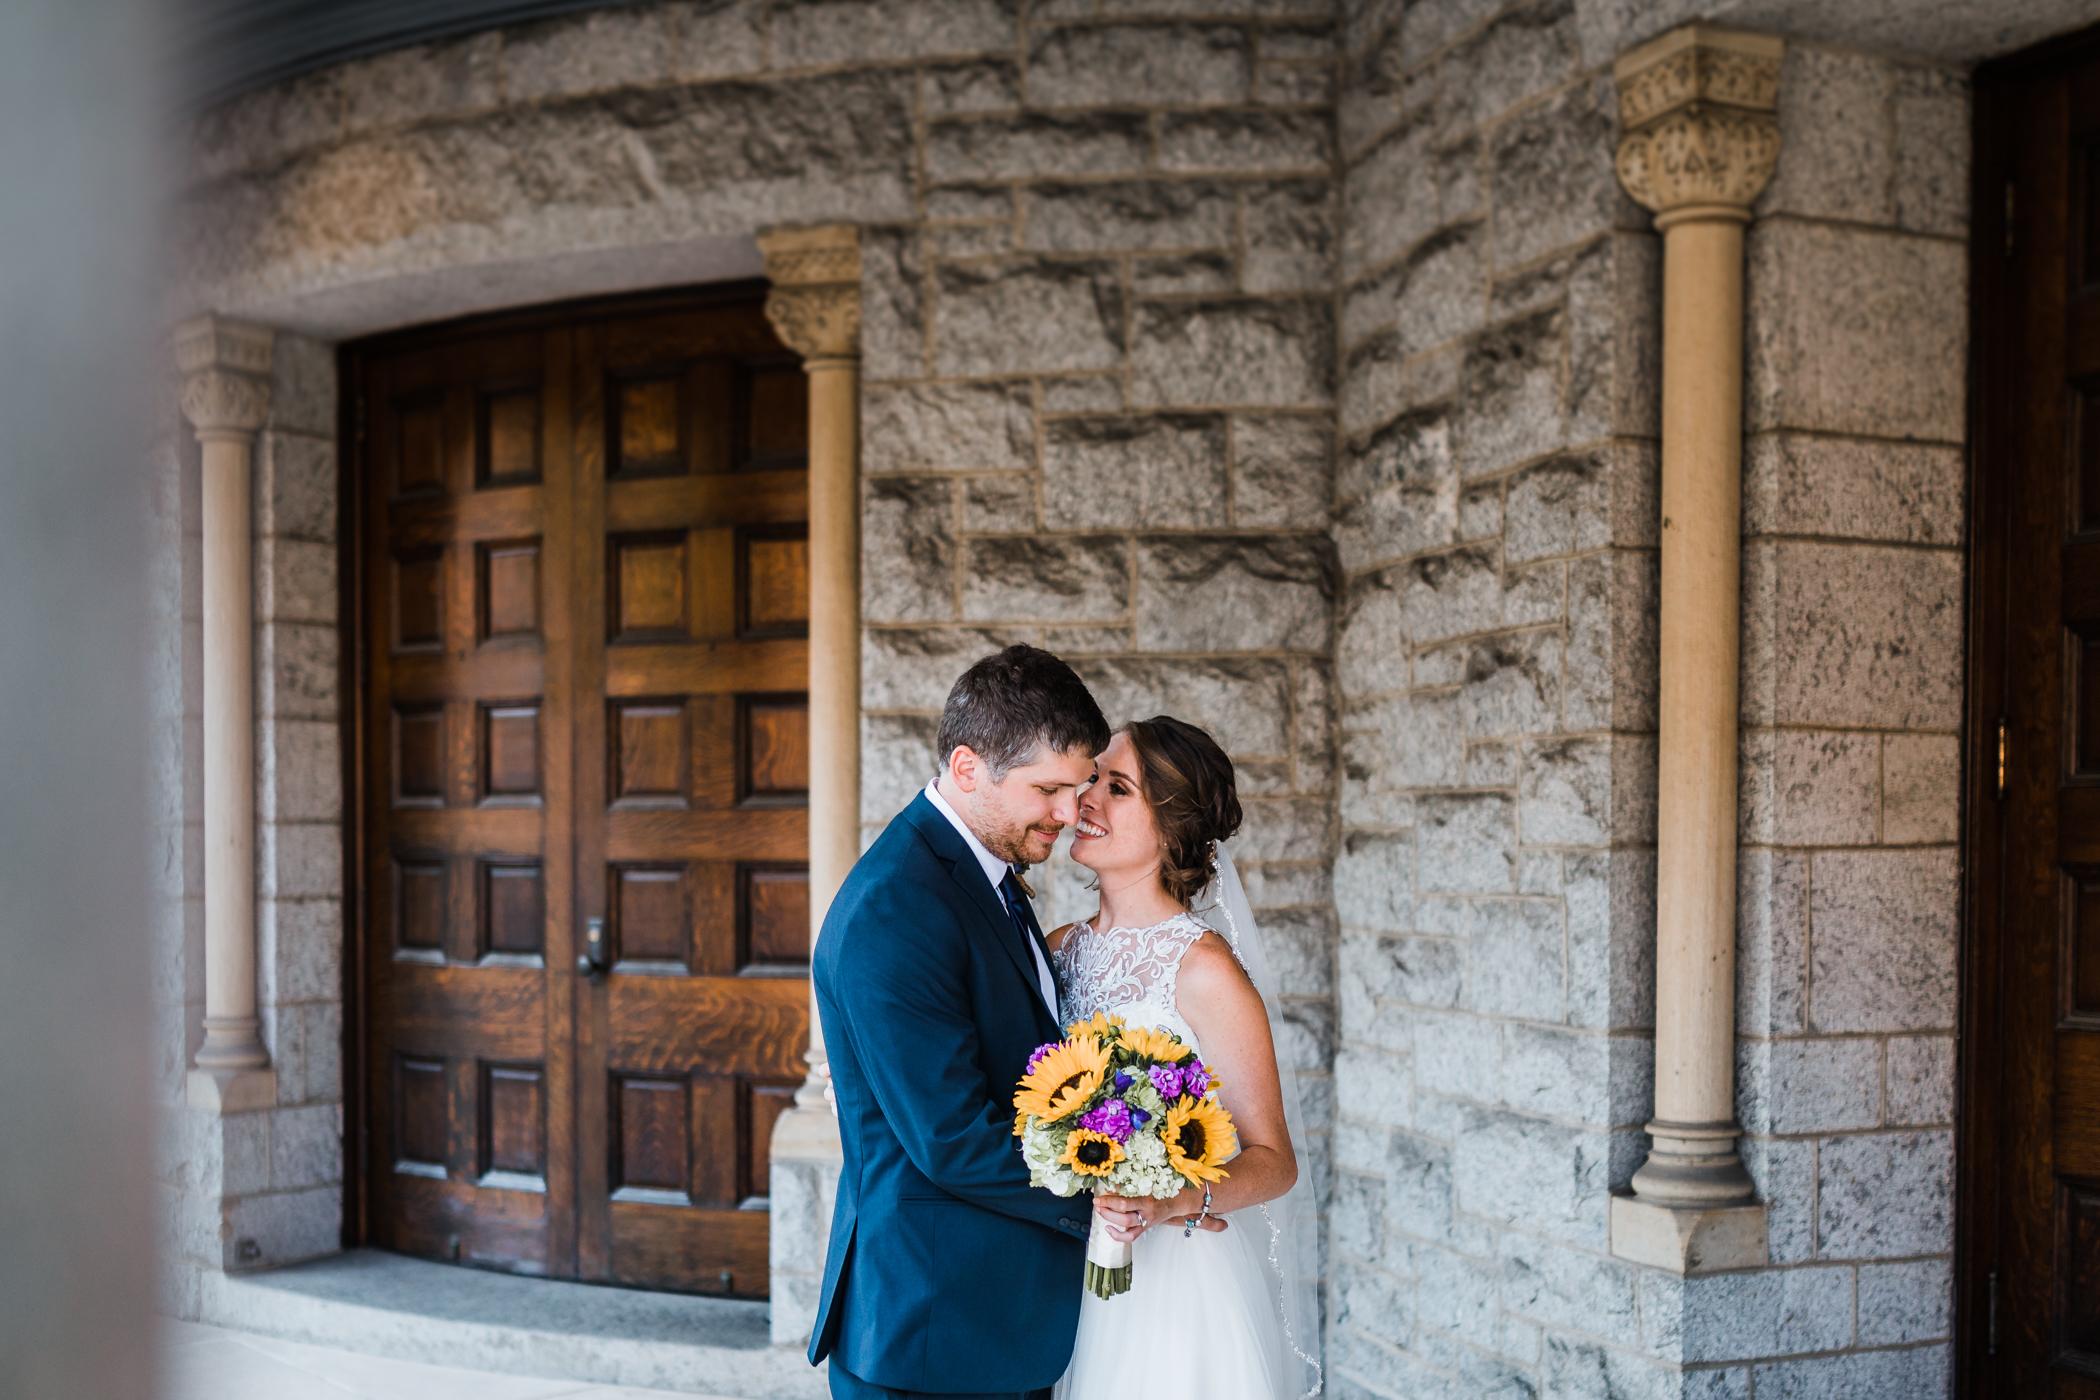 greek orthodox wedding in baltimore maryland - top rated maryland wedding photographer